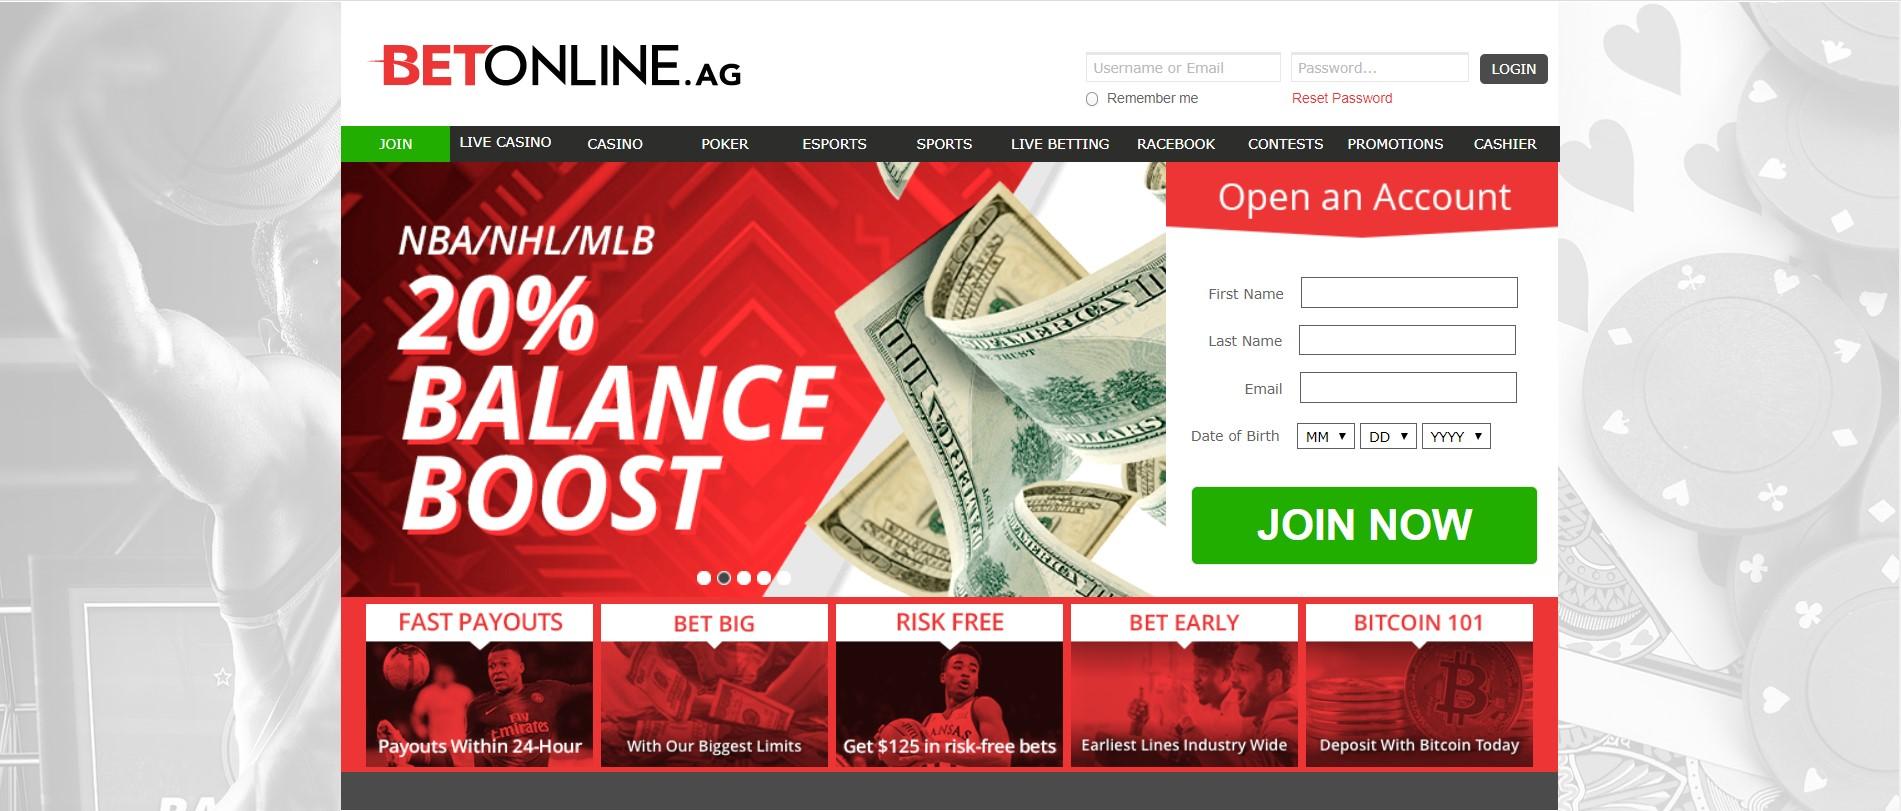 BetOnline balance boost